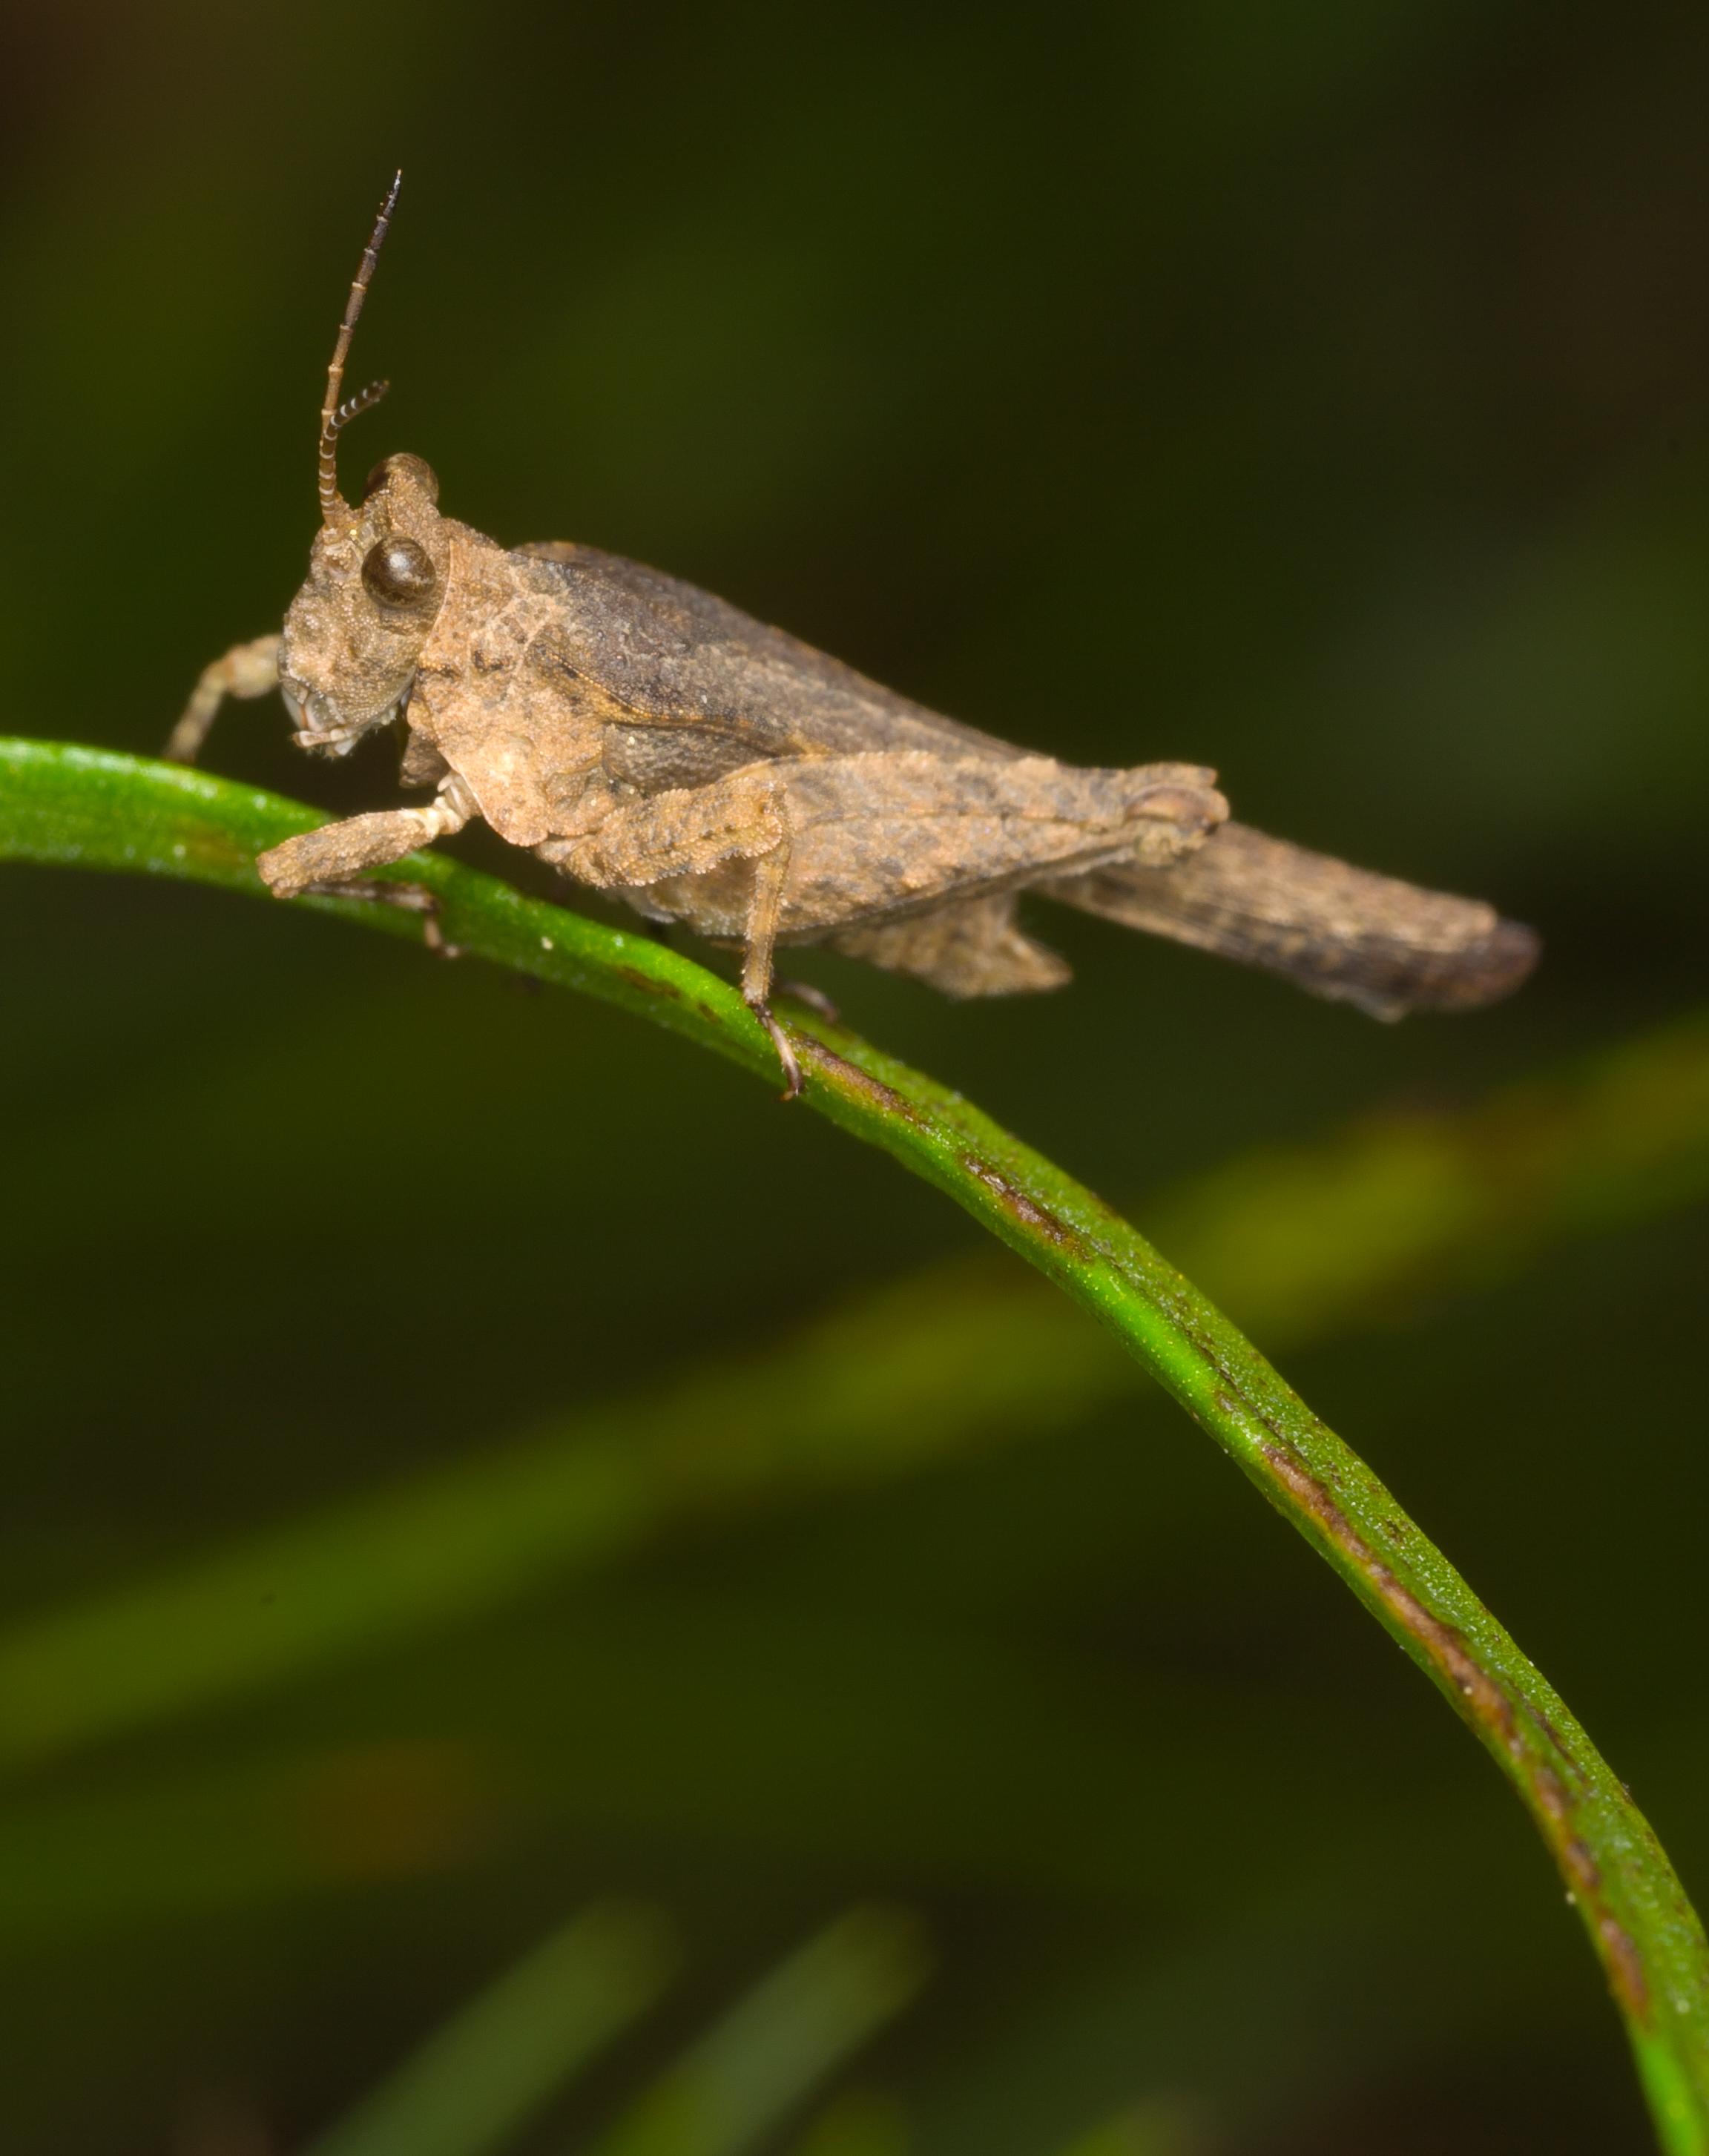 Obscure Pygmy Grasshopper - Species: Tetrix arenosa